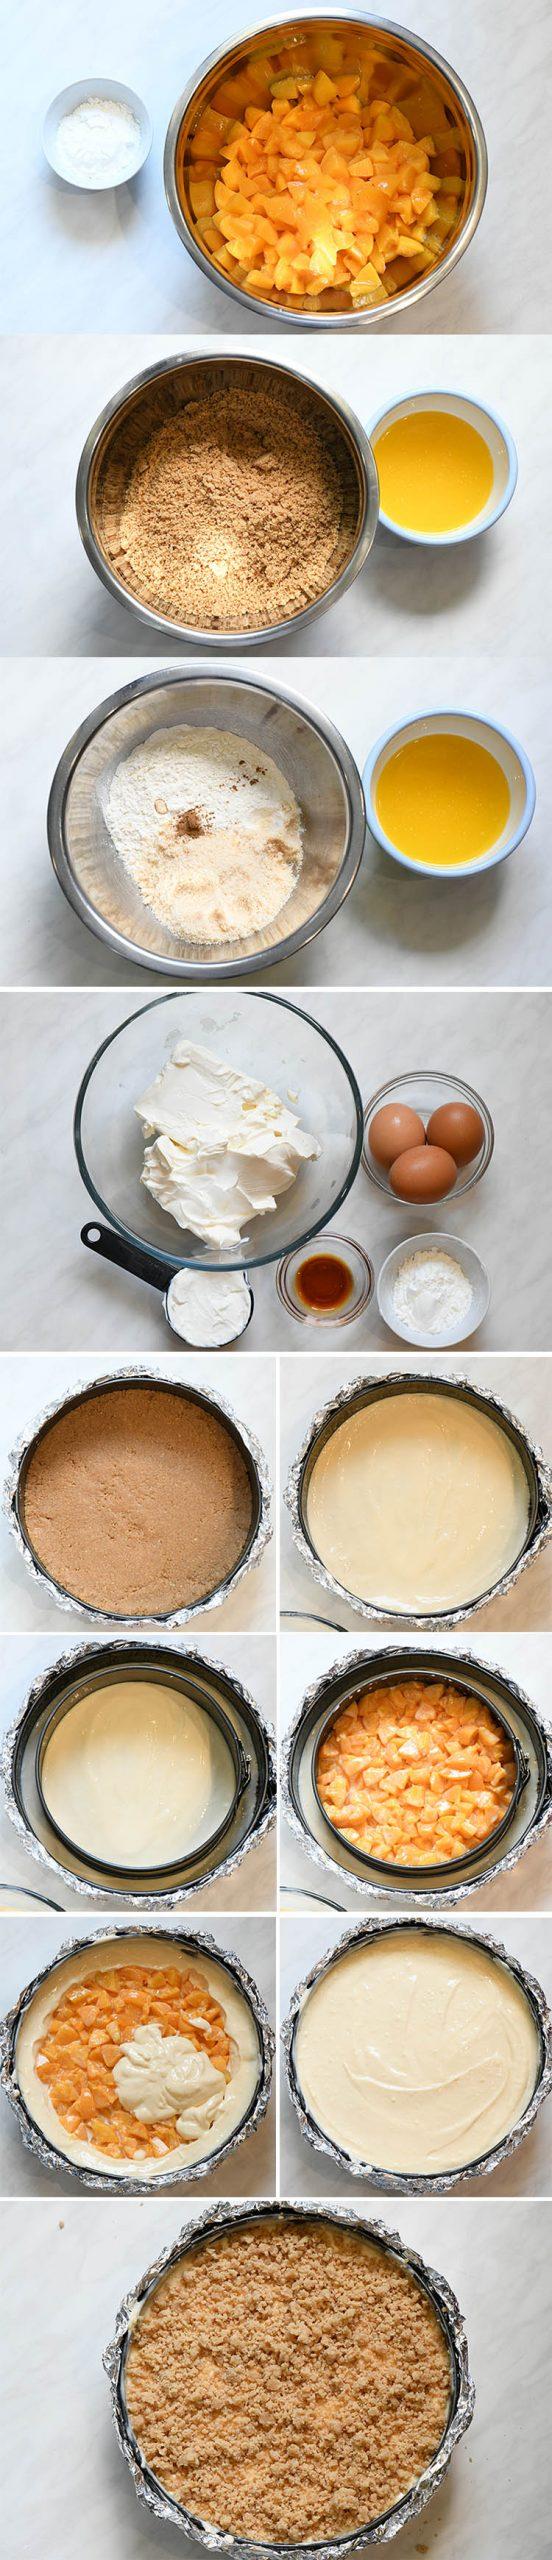 Peach Cheesecake Instructions